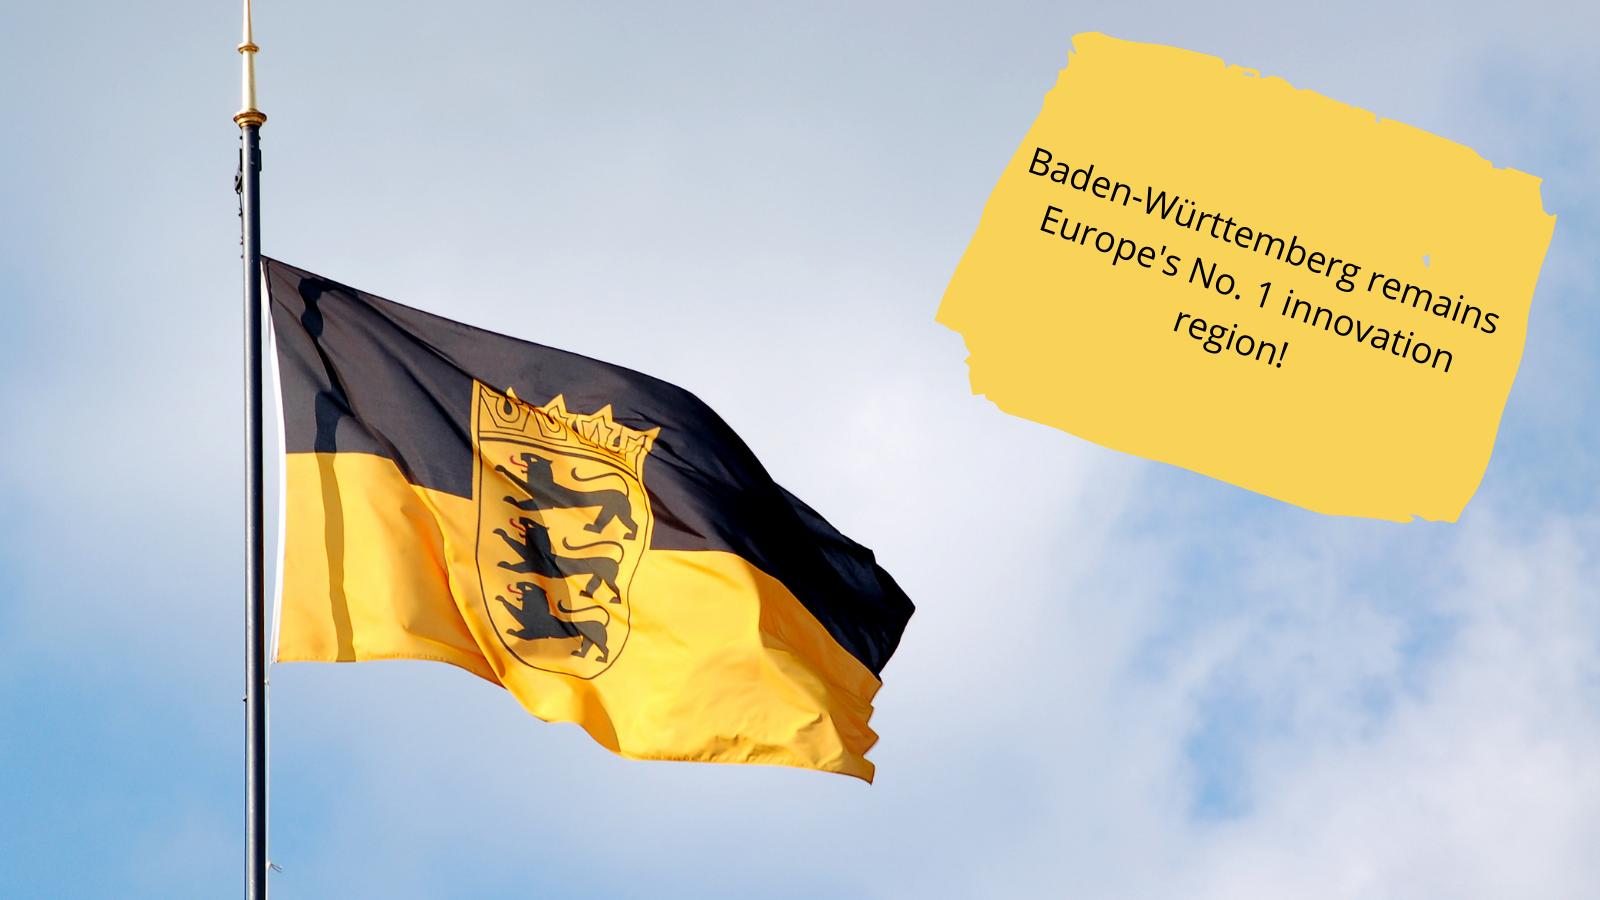 Baden-Württemberg ist erneut Innovationsregion Nr. 1 Europas